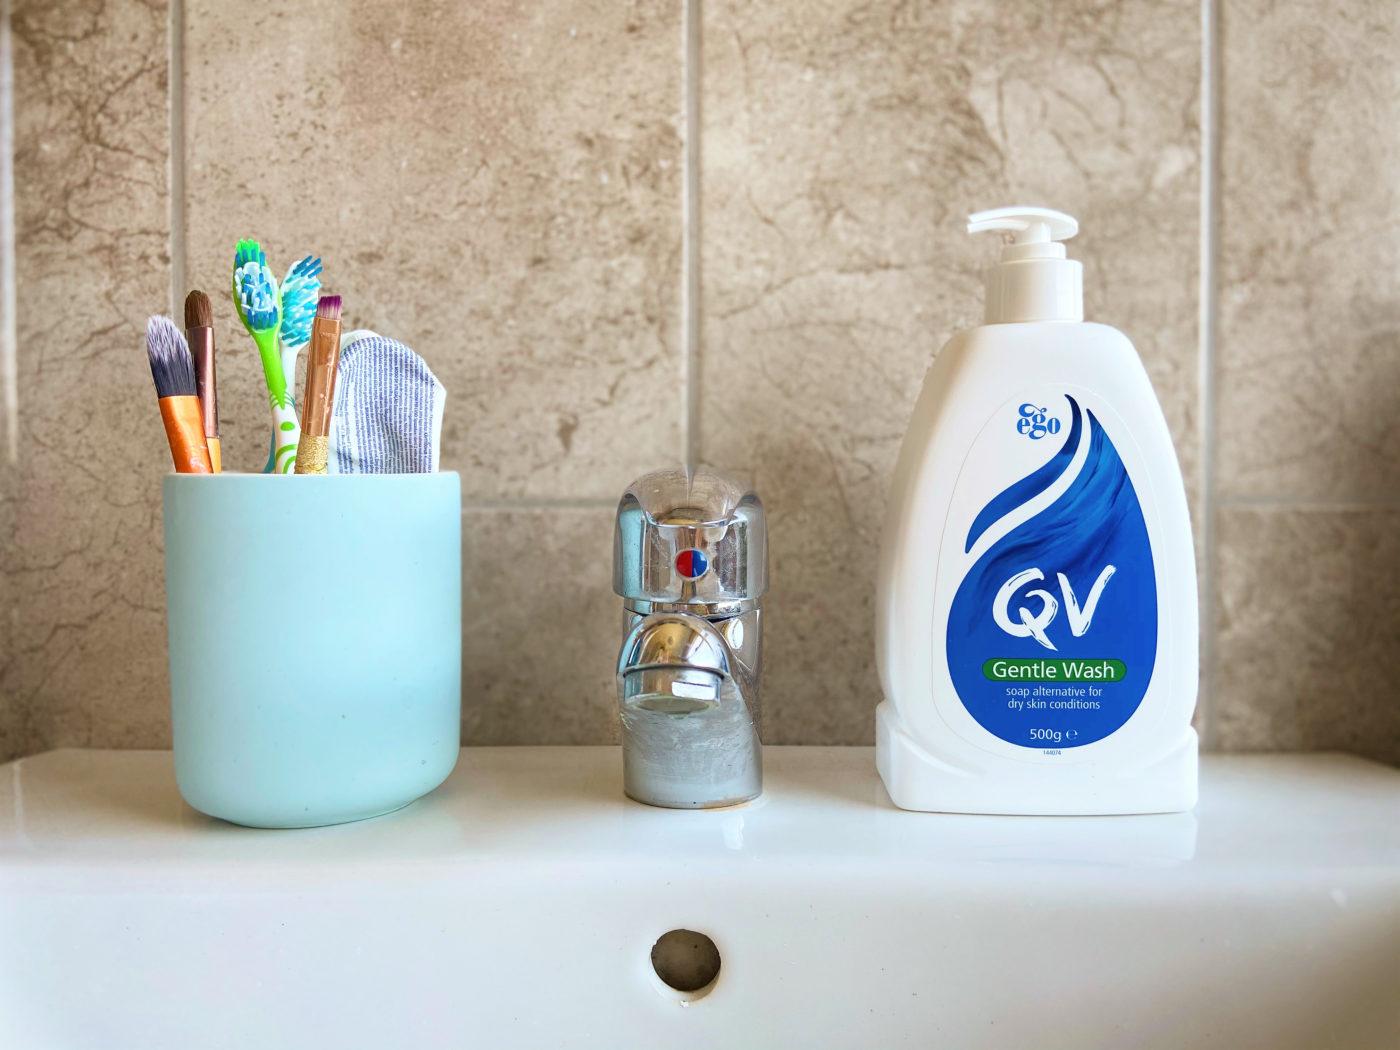 QV Sopa free wash